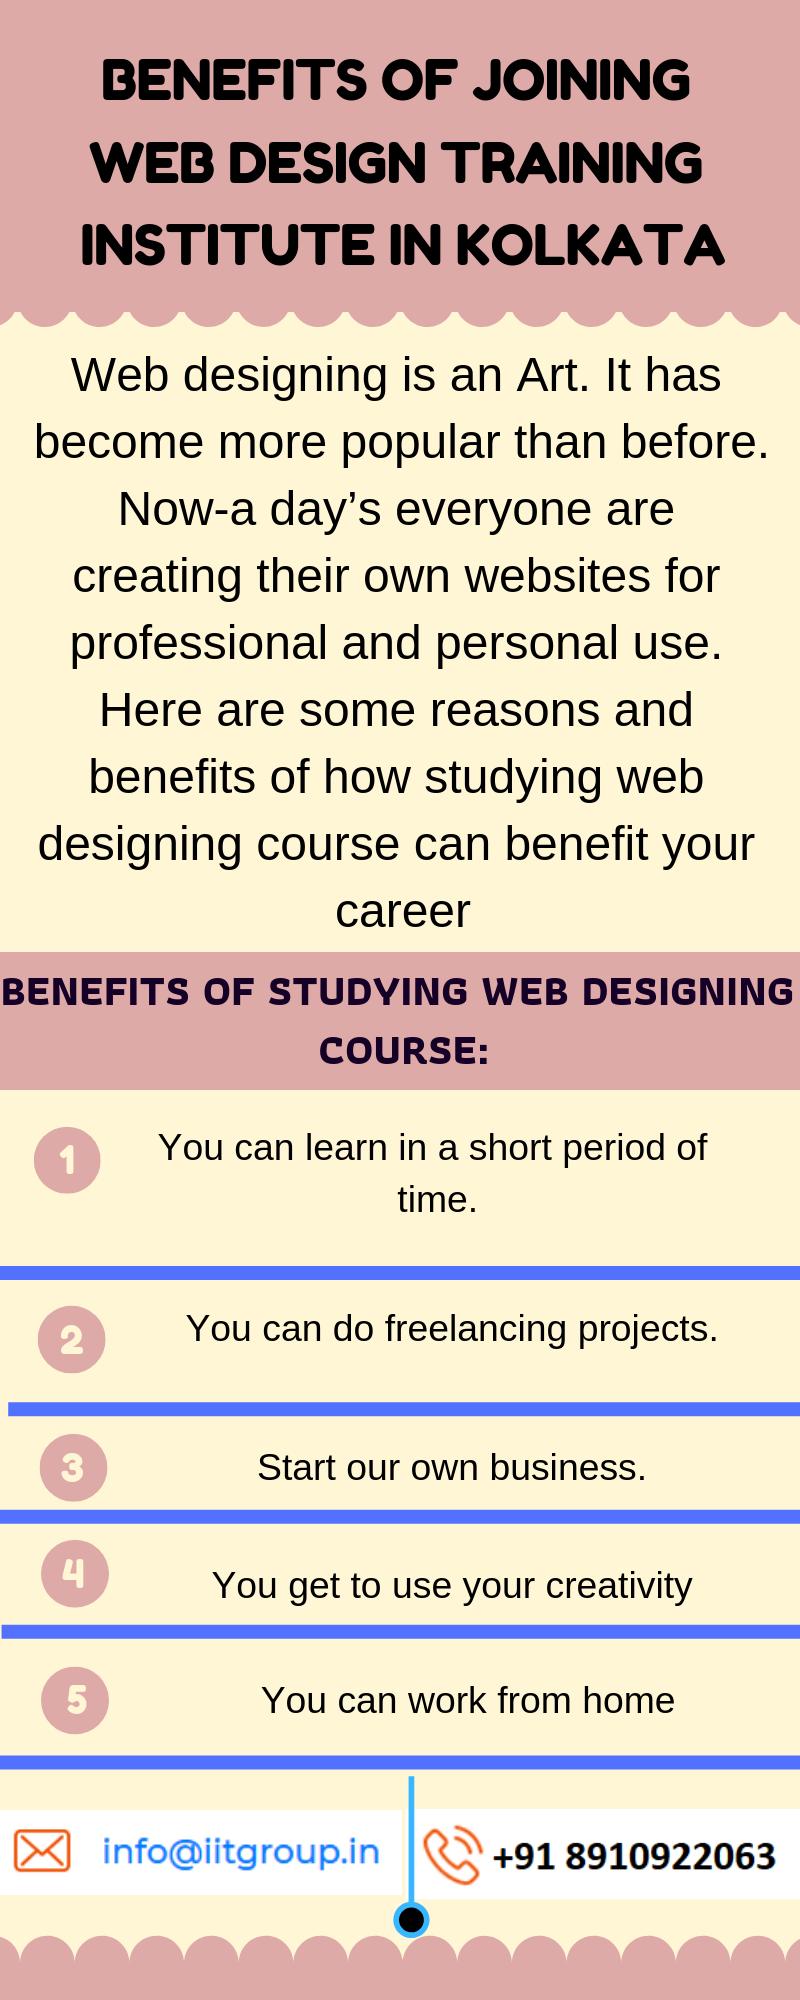 Benefits Of Joining Web Design Training Institute In Kolkata Web Design Course Web Design Training Web Design